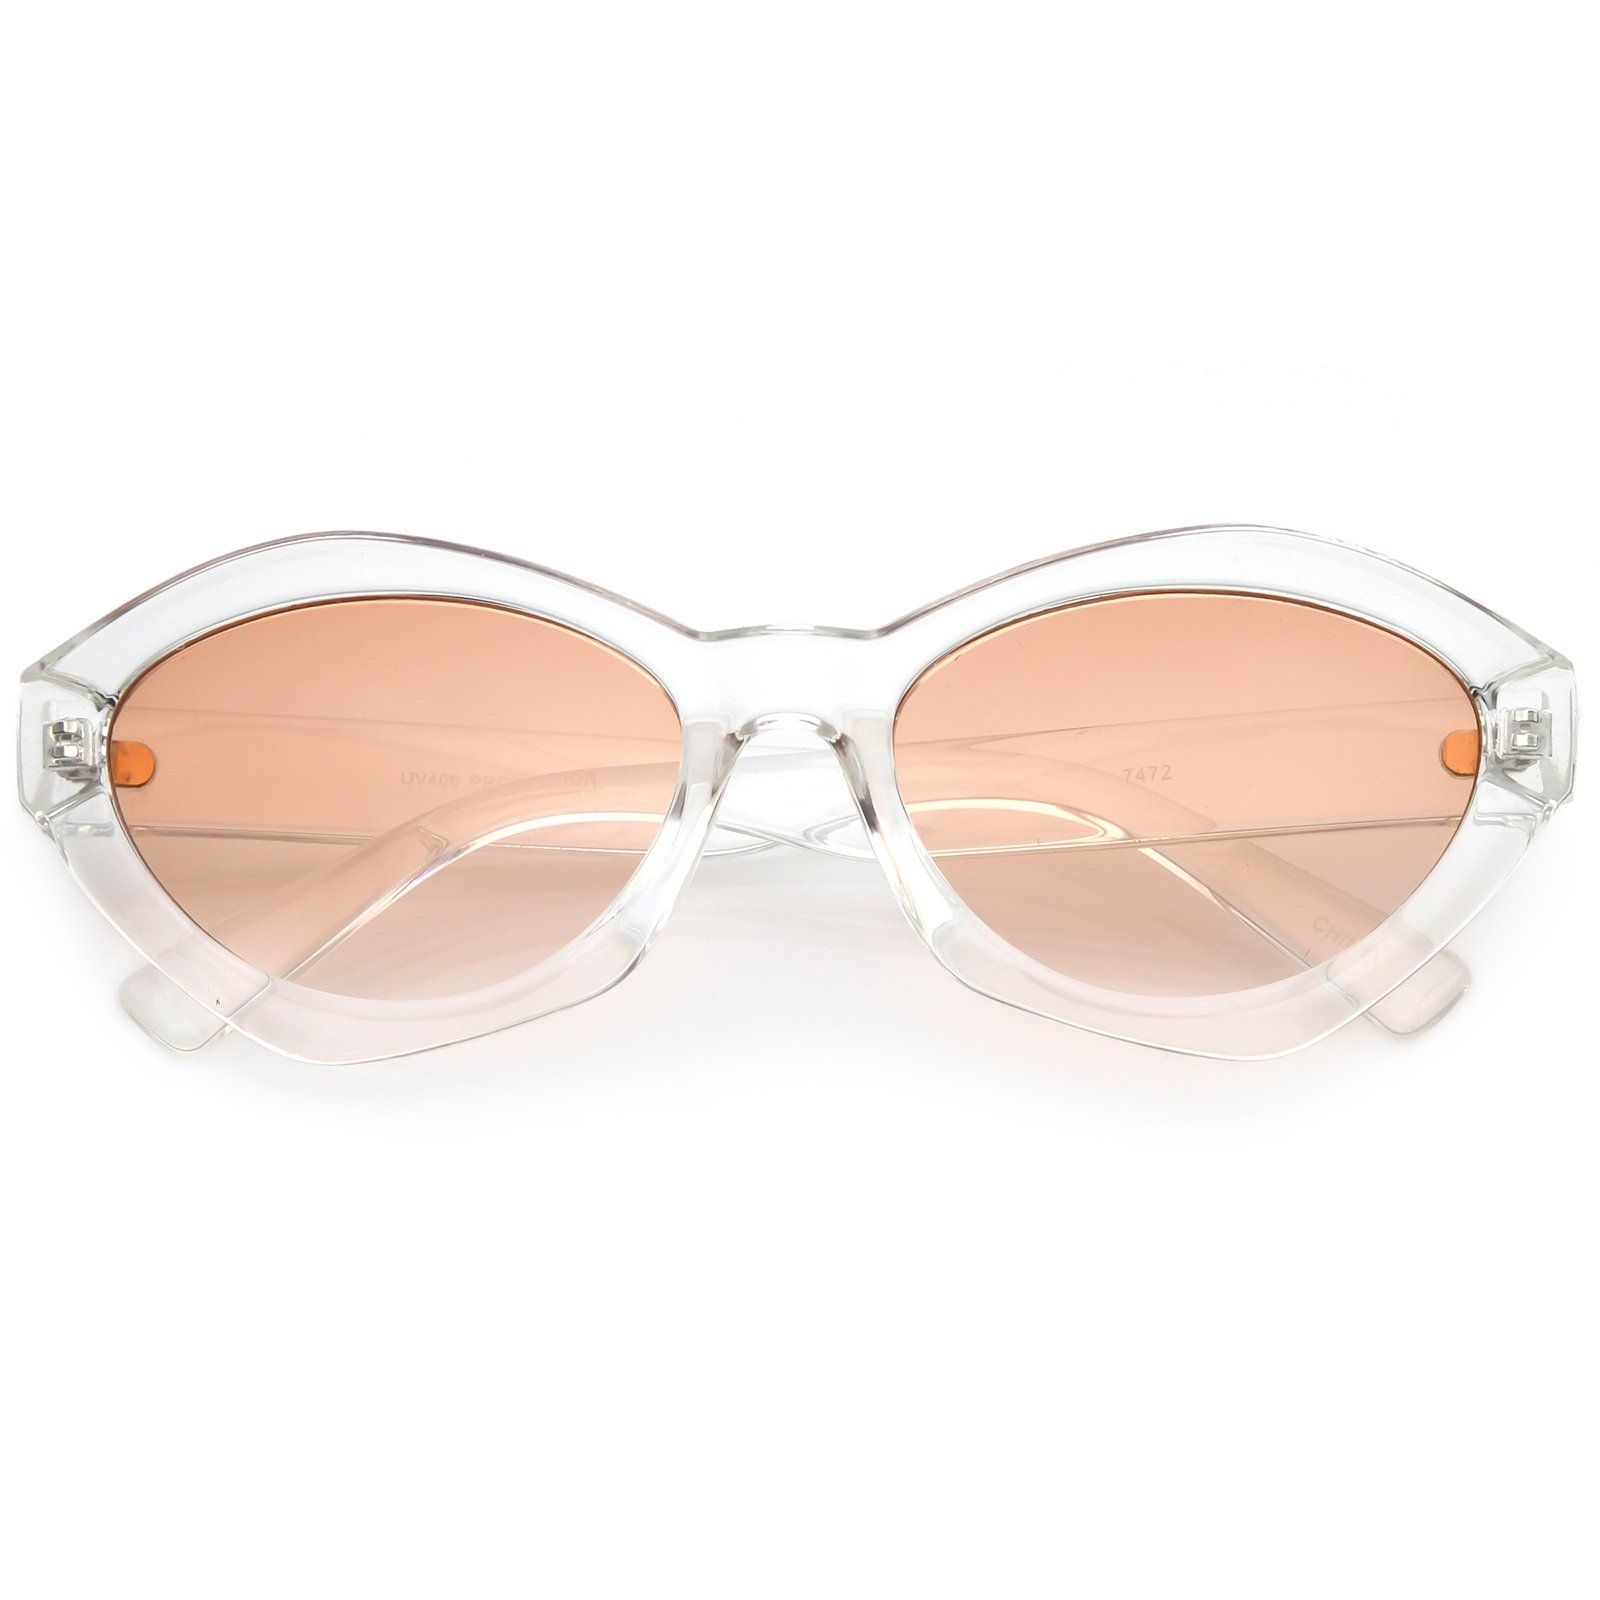 77838cb9734 Modern Chunky Neutral Colored Cat Eye Sunglasses Oval Flat Lens 56mm  frame   sunglass